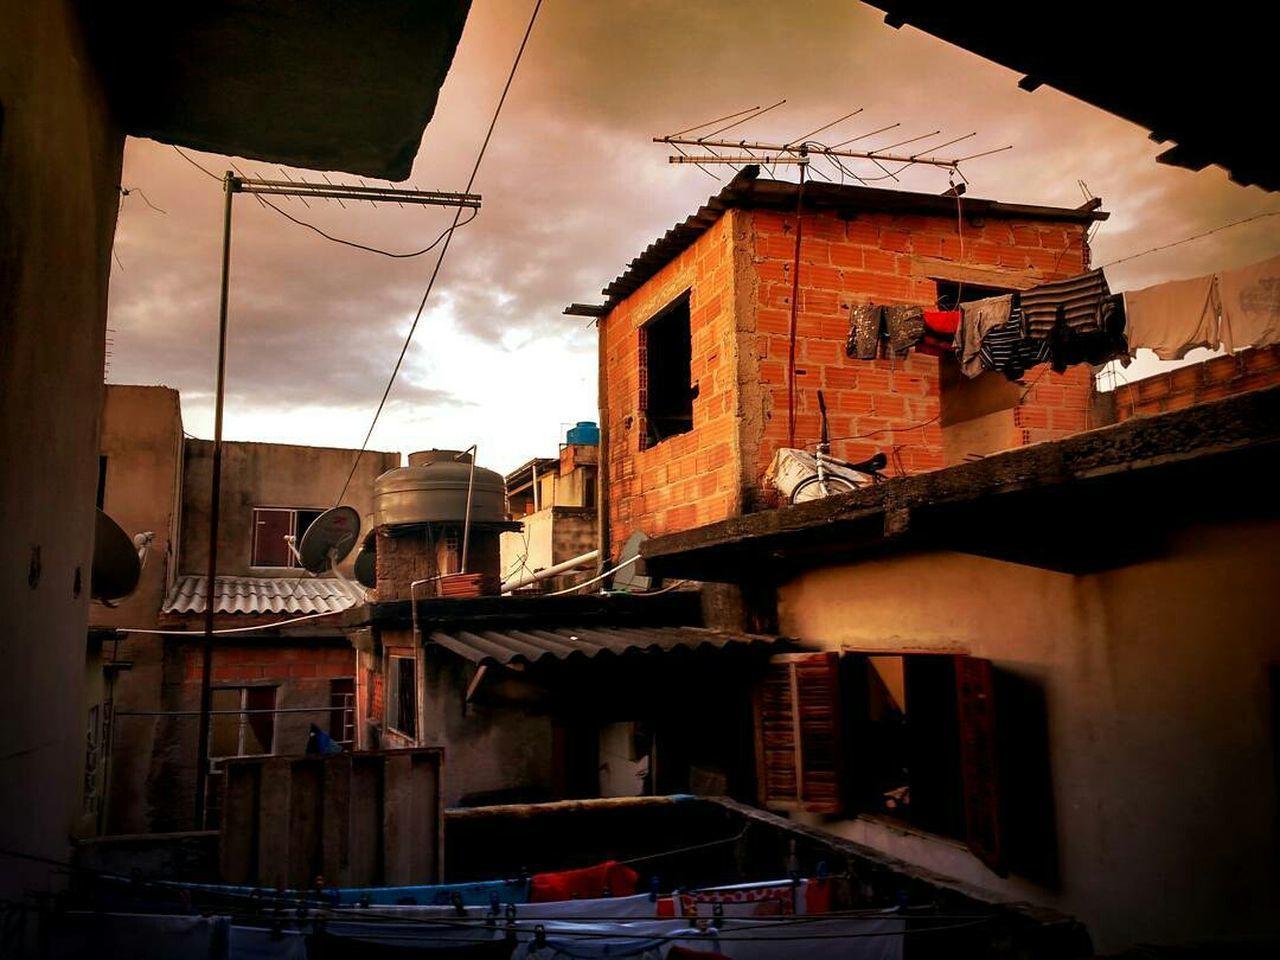 Minhacasa My House Belezaurbana Construção Build Structure EyeEmNewHere